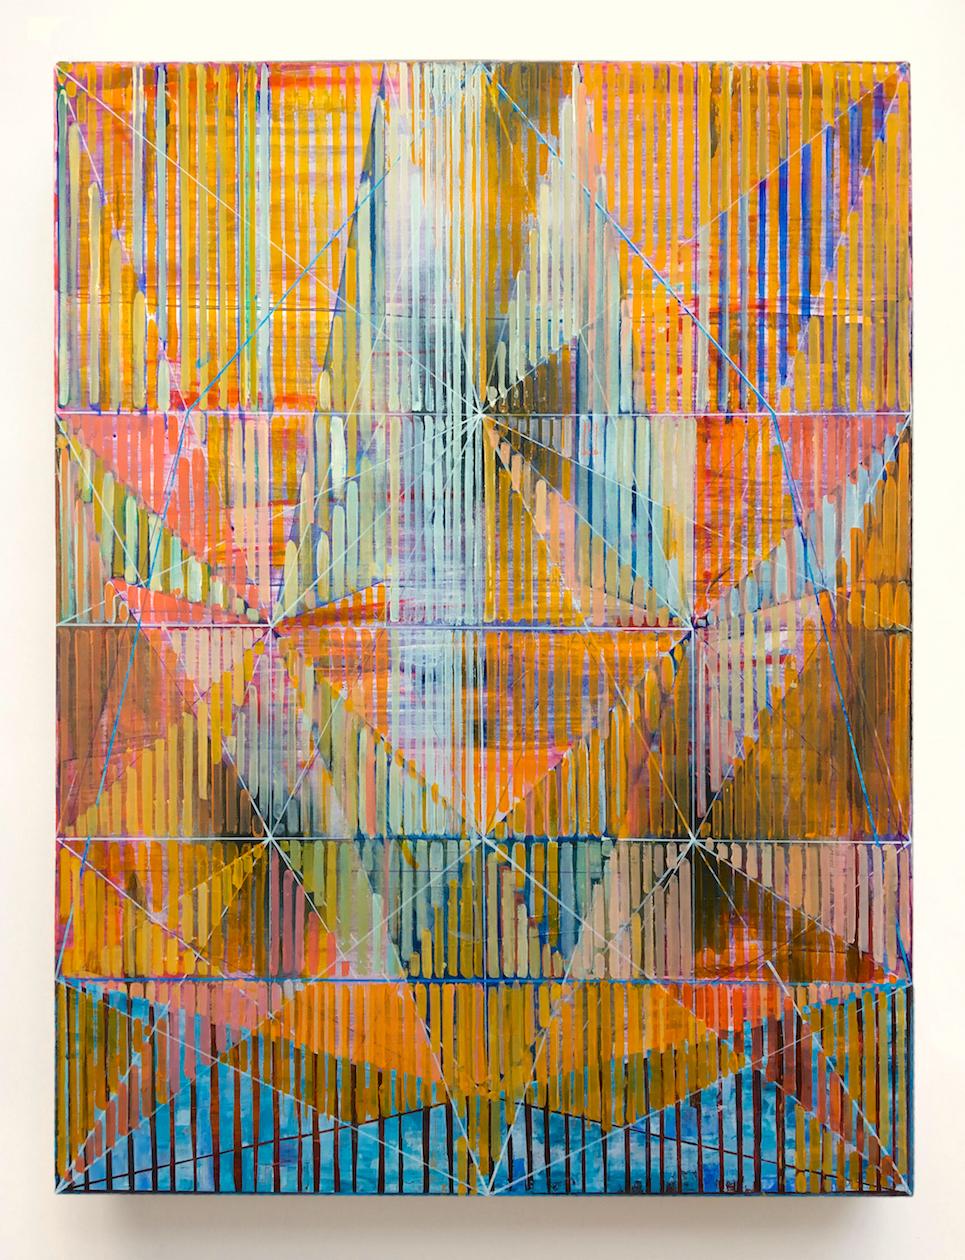 Joe Lloyd, Orange Offset Pattern, 2017, acrylic on canvas, 48 x 36 inches